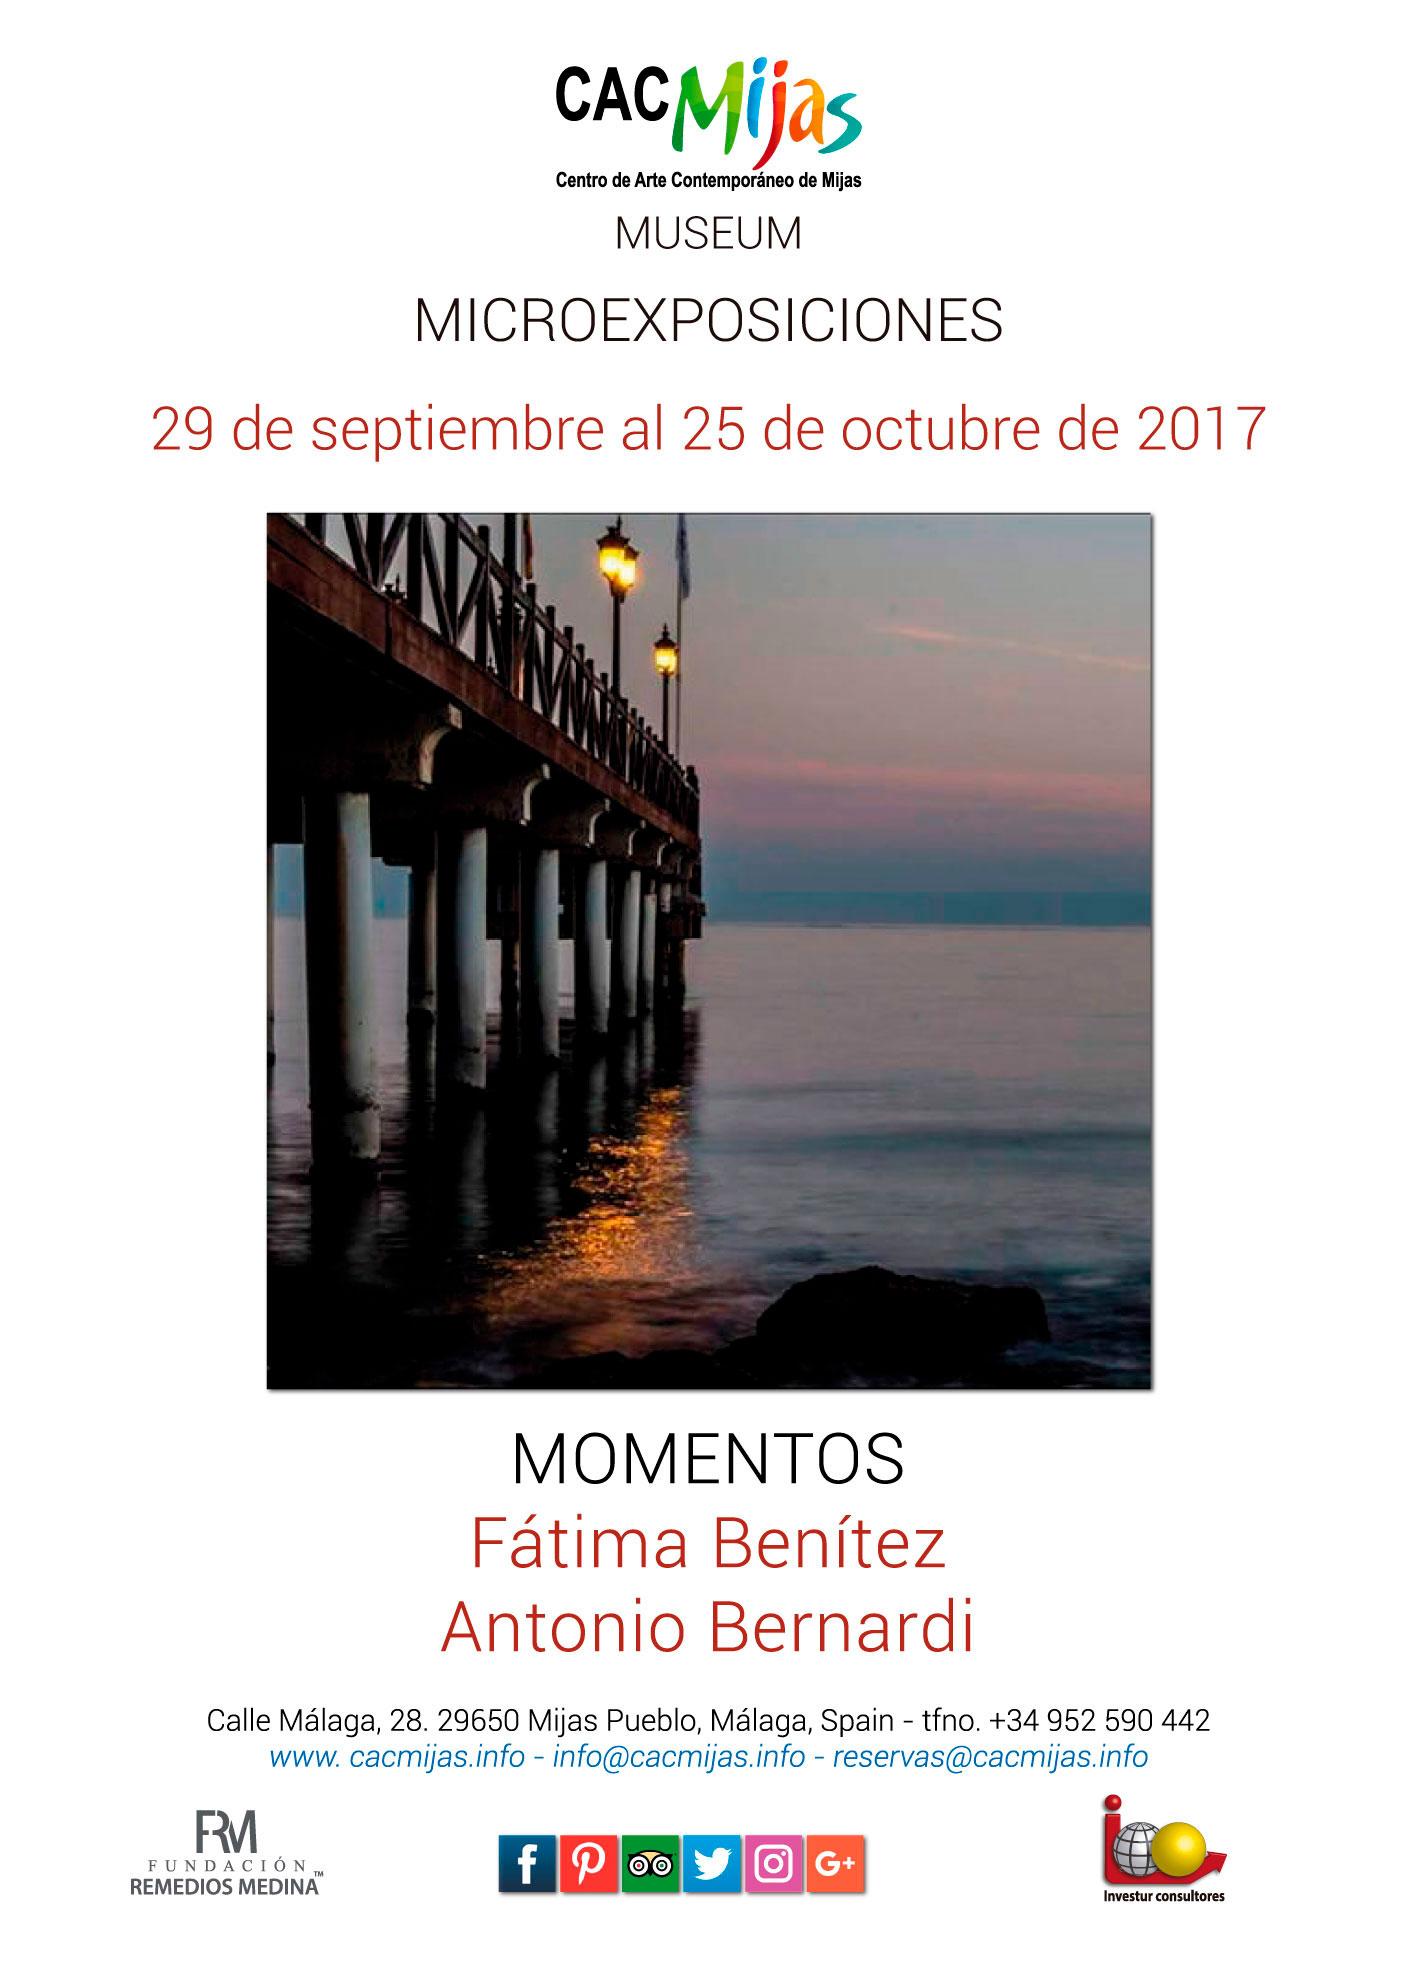 FÁTIMA BENÍTEZ Y ANTONIO BERNARDI. MOMENTOS